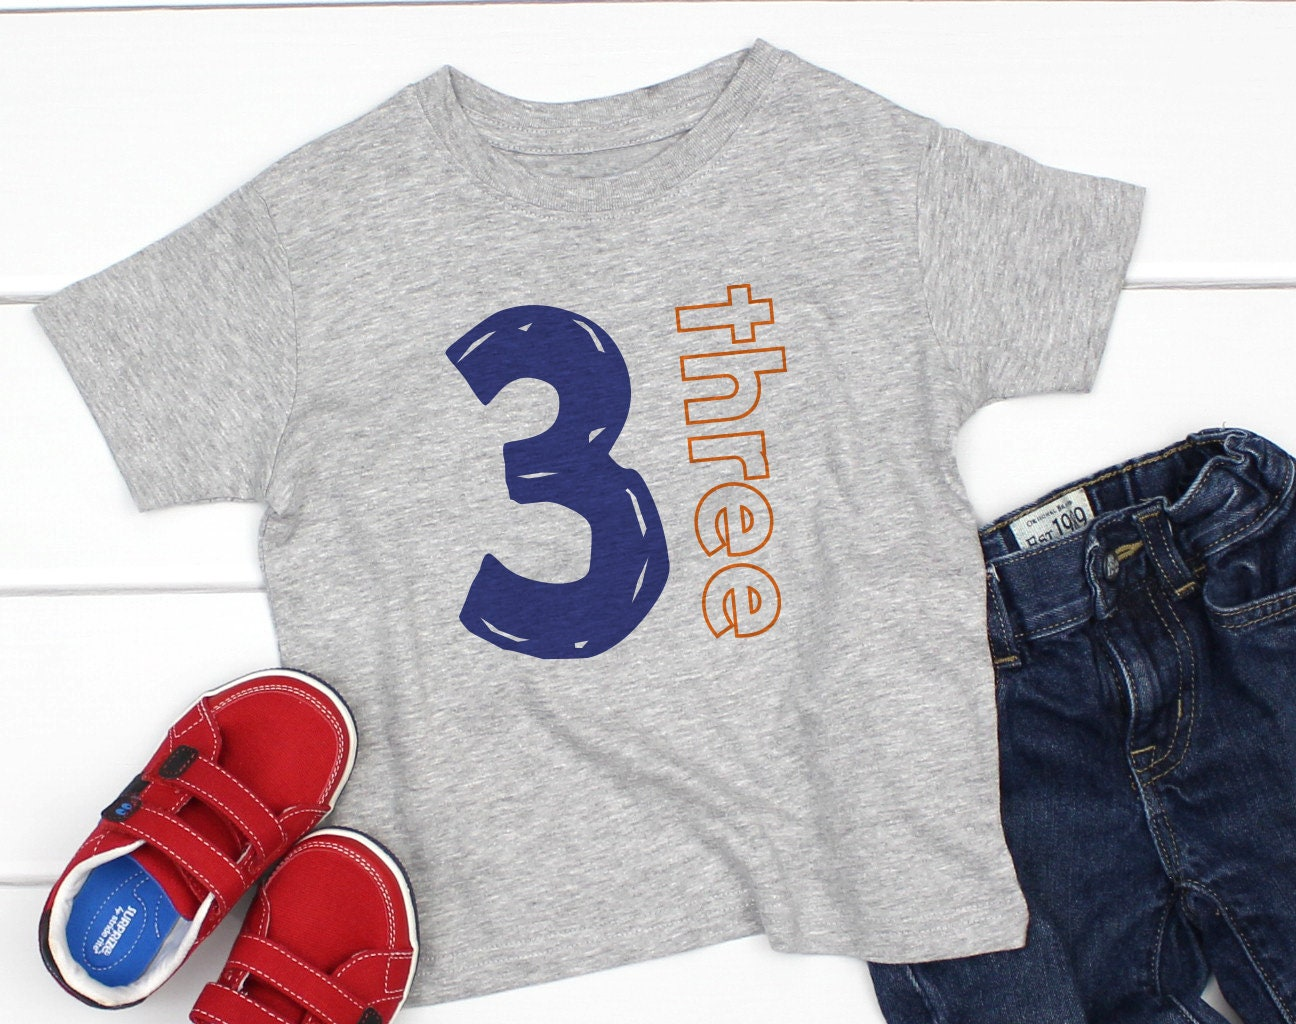 3 Year Old Birthday Shirts For Boy Third Shirt